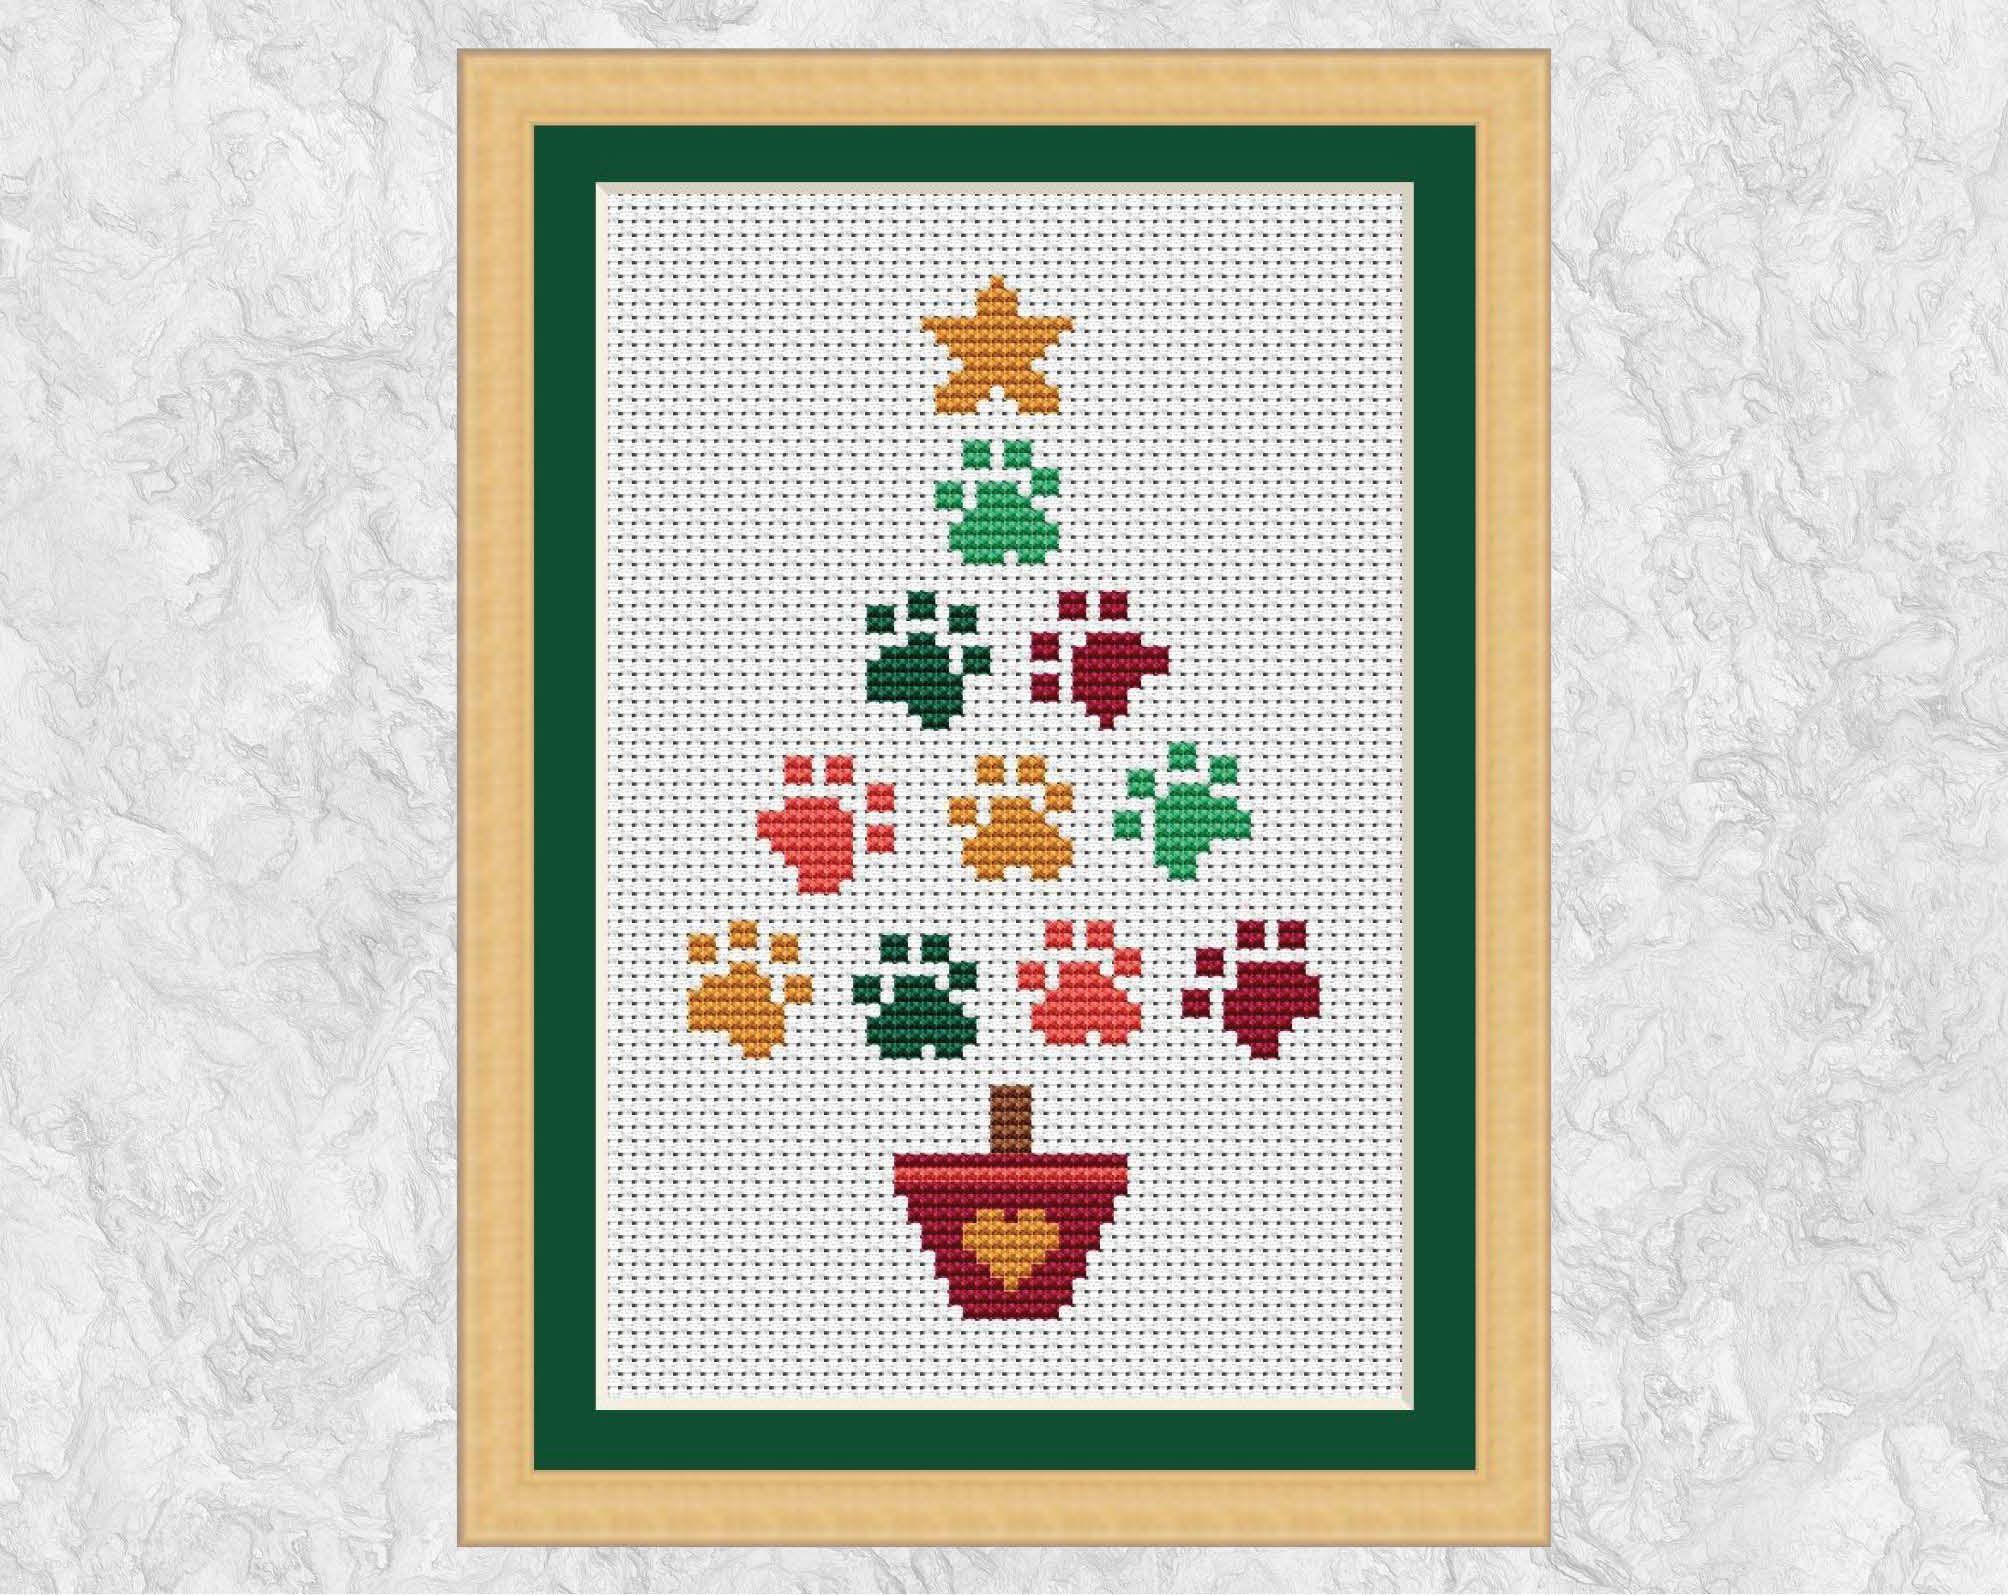 Christmas Card Cross Stitch Pattern Paw Print Christmas Tree Etsy Cross Stitch Christmas Cards Cross Stitch Tree Cross Stitch Patterns